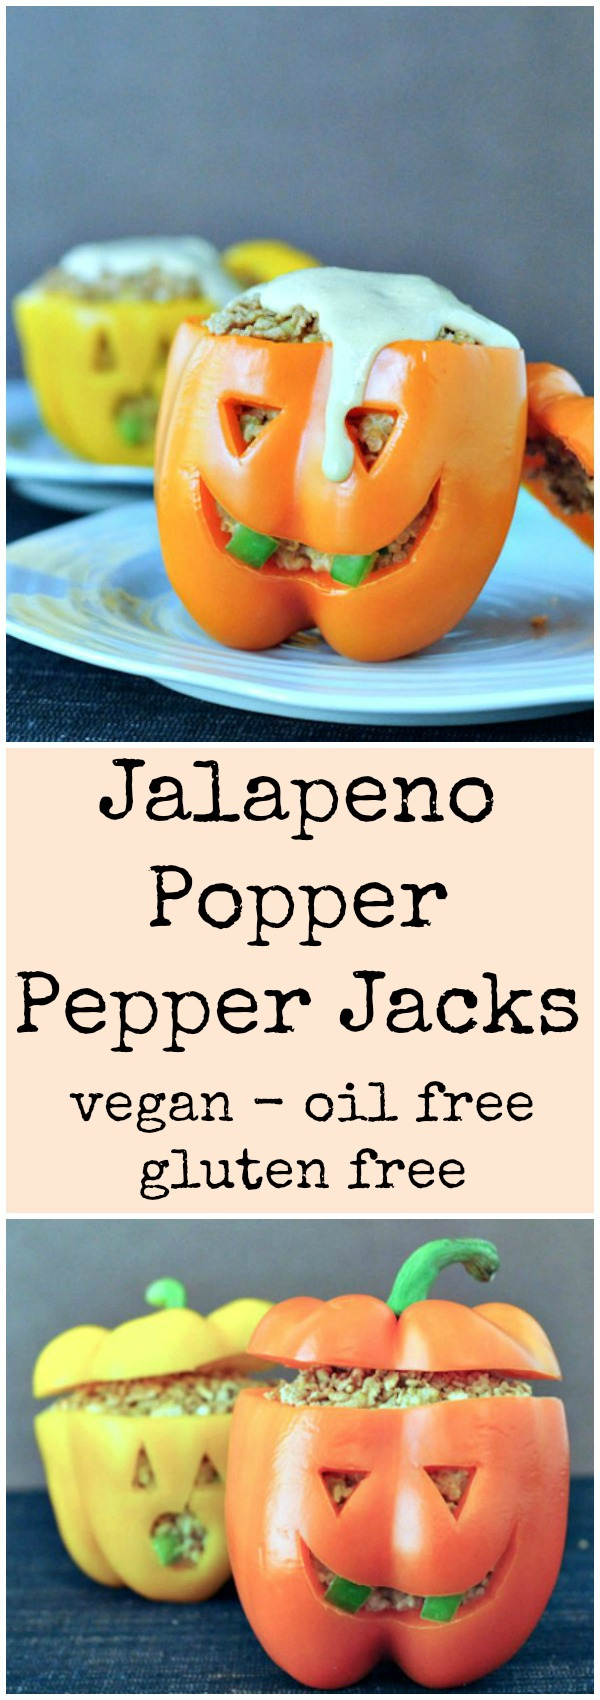 Jalapeno Popper Pepper Jacks @spabettie #vegan #glutenfree #oilfree